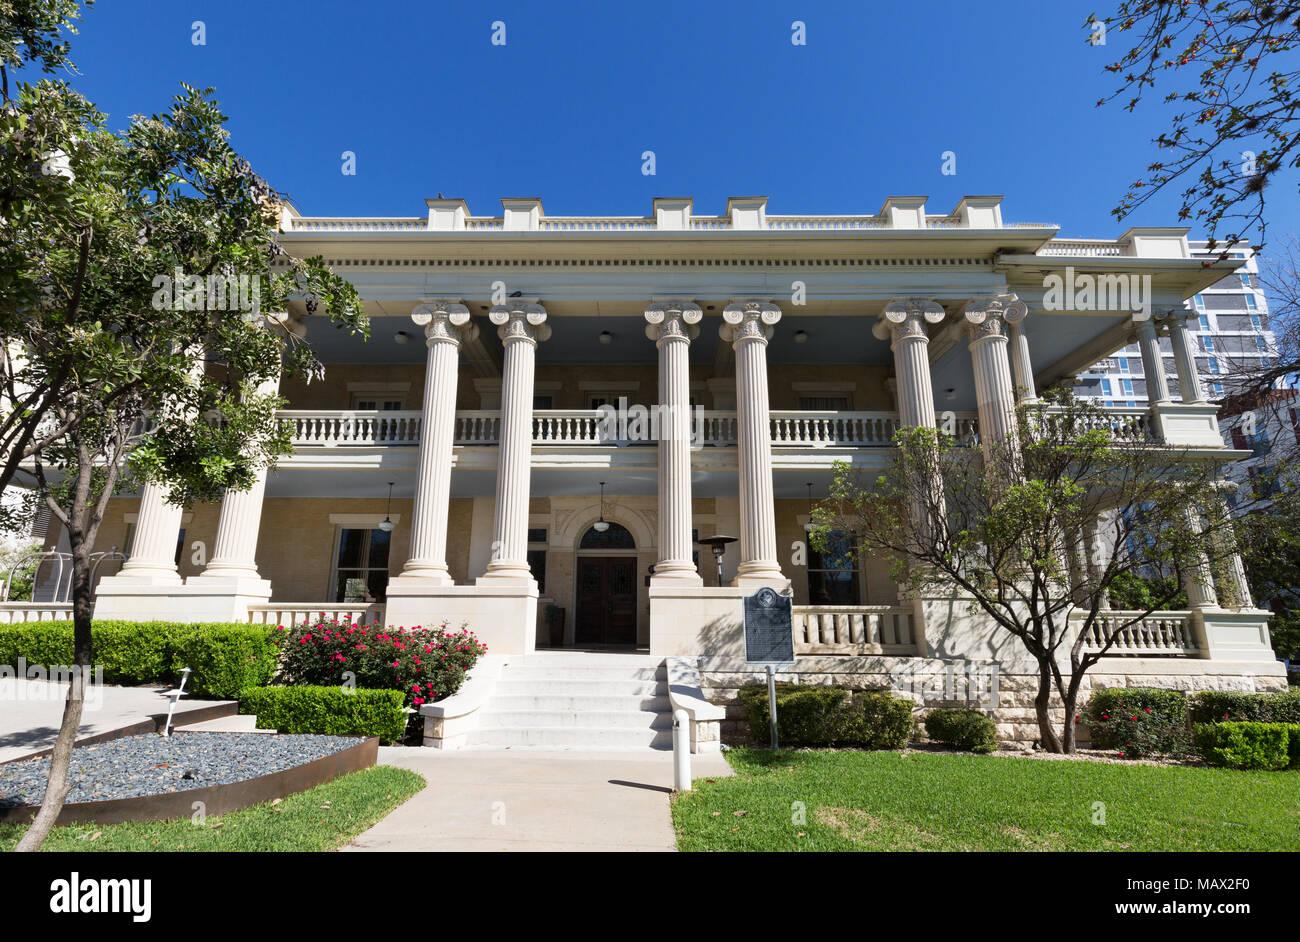 Das Hotel Ella, Austin, Texas, USA Stockbild